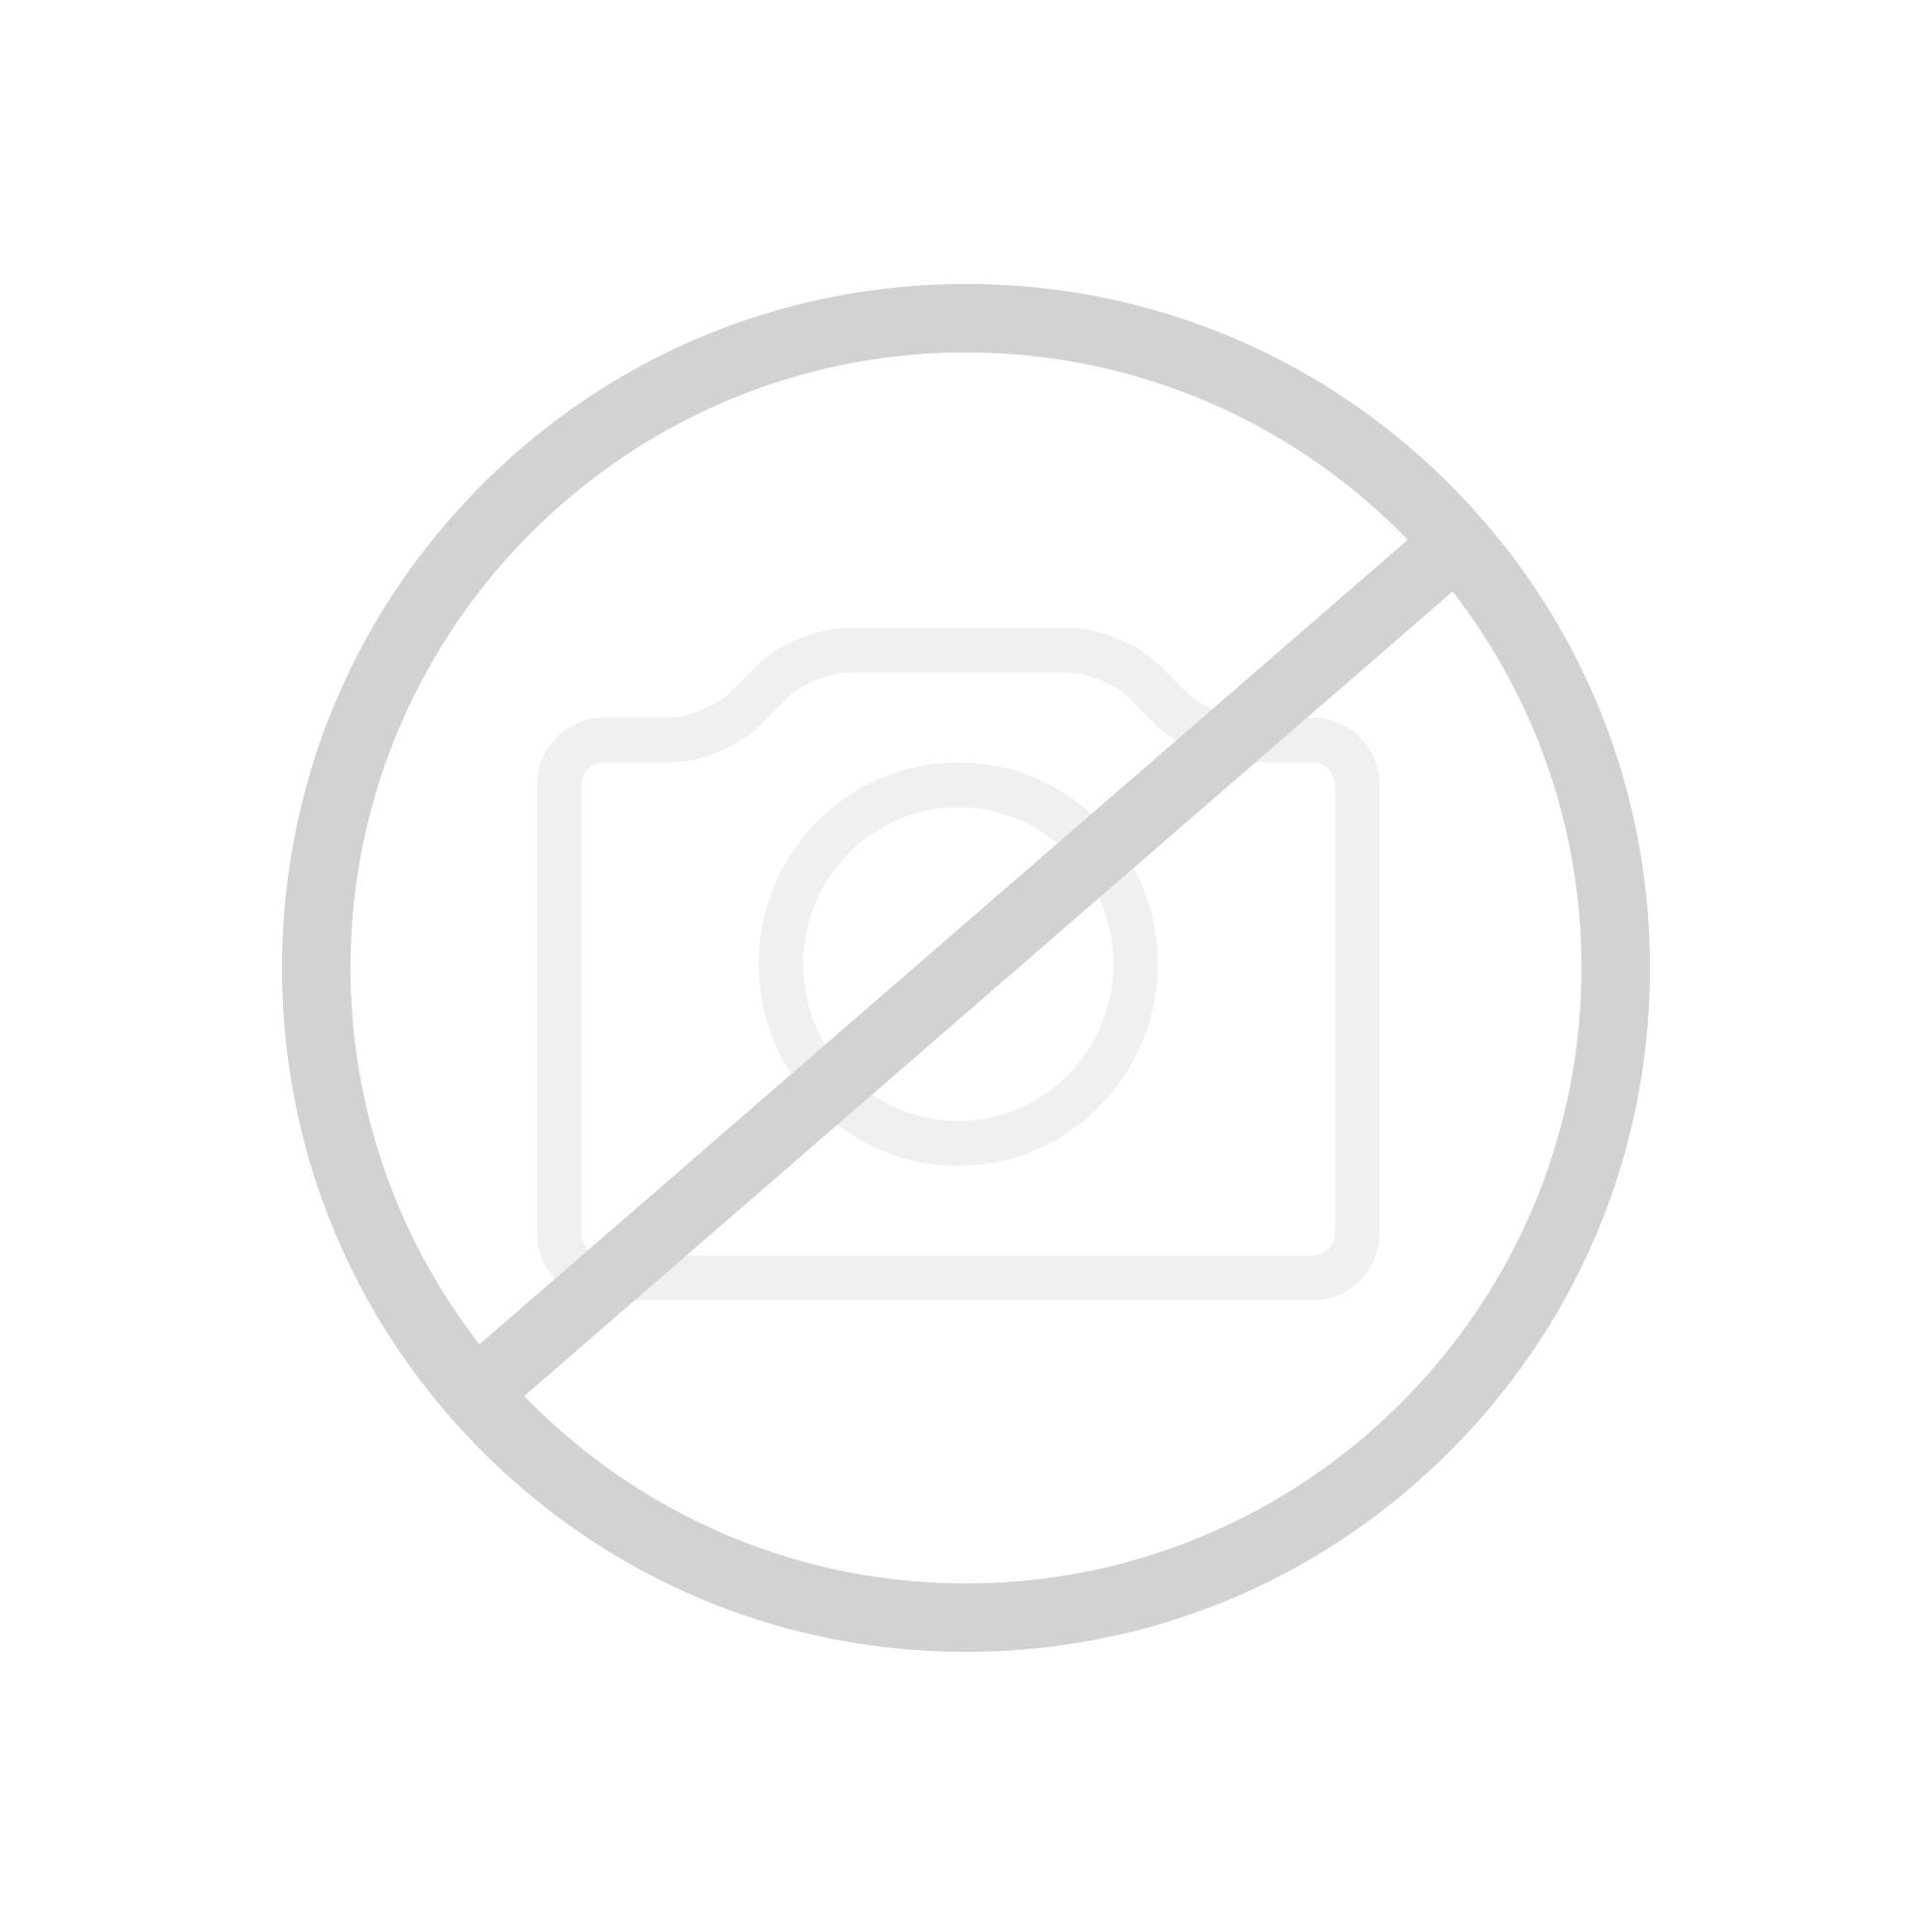 Hansa Universal Wandbrausehalter